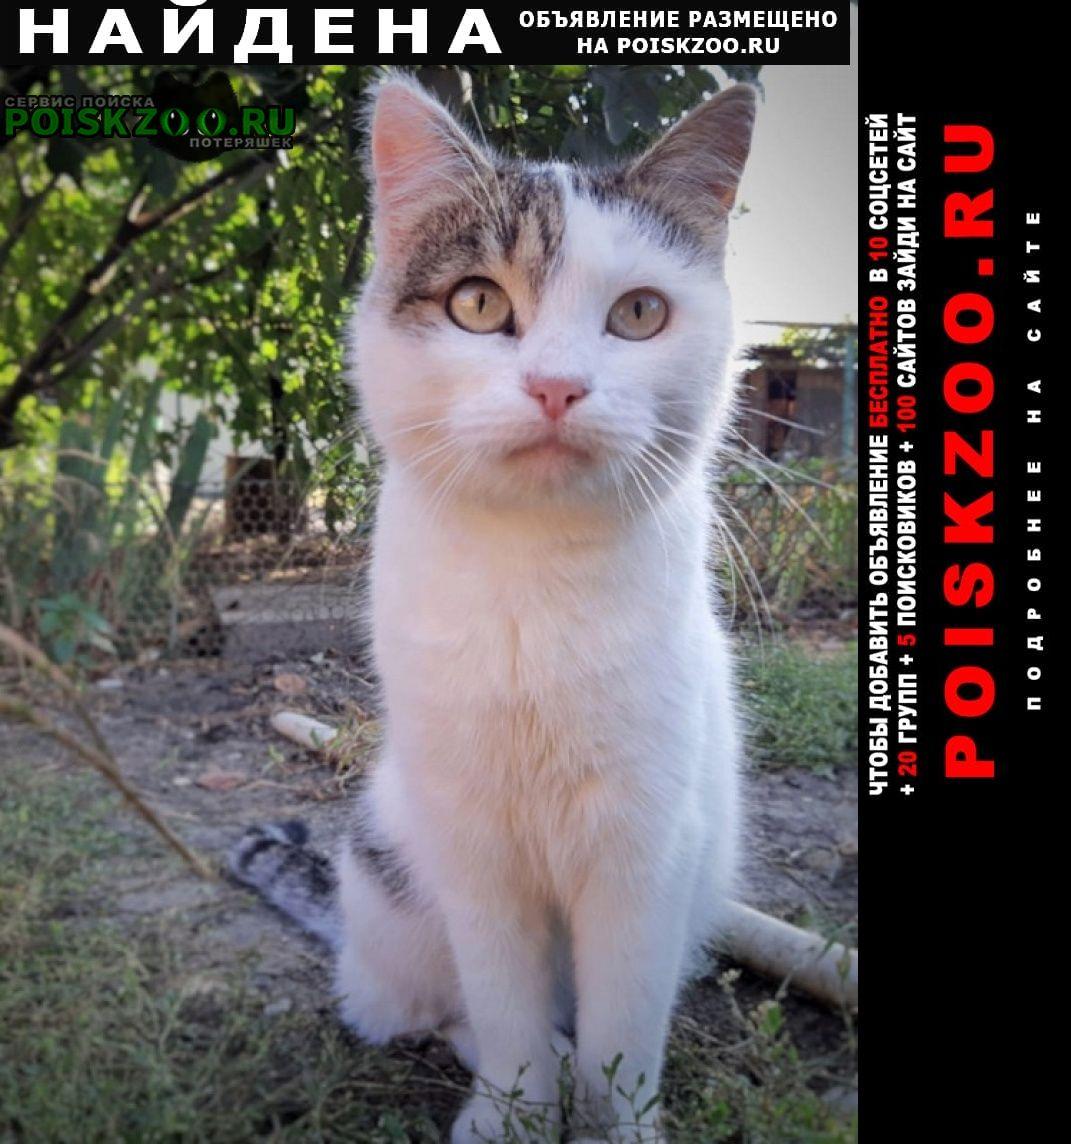 Найдена кошка прелестная, зовут лапка Краснодар